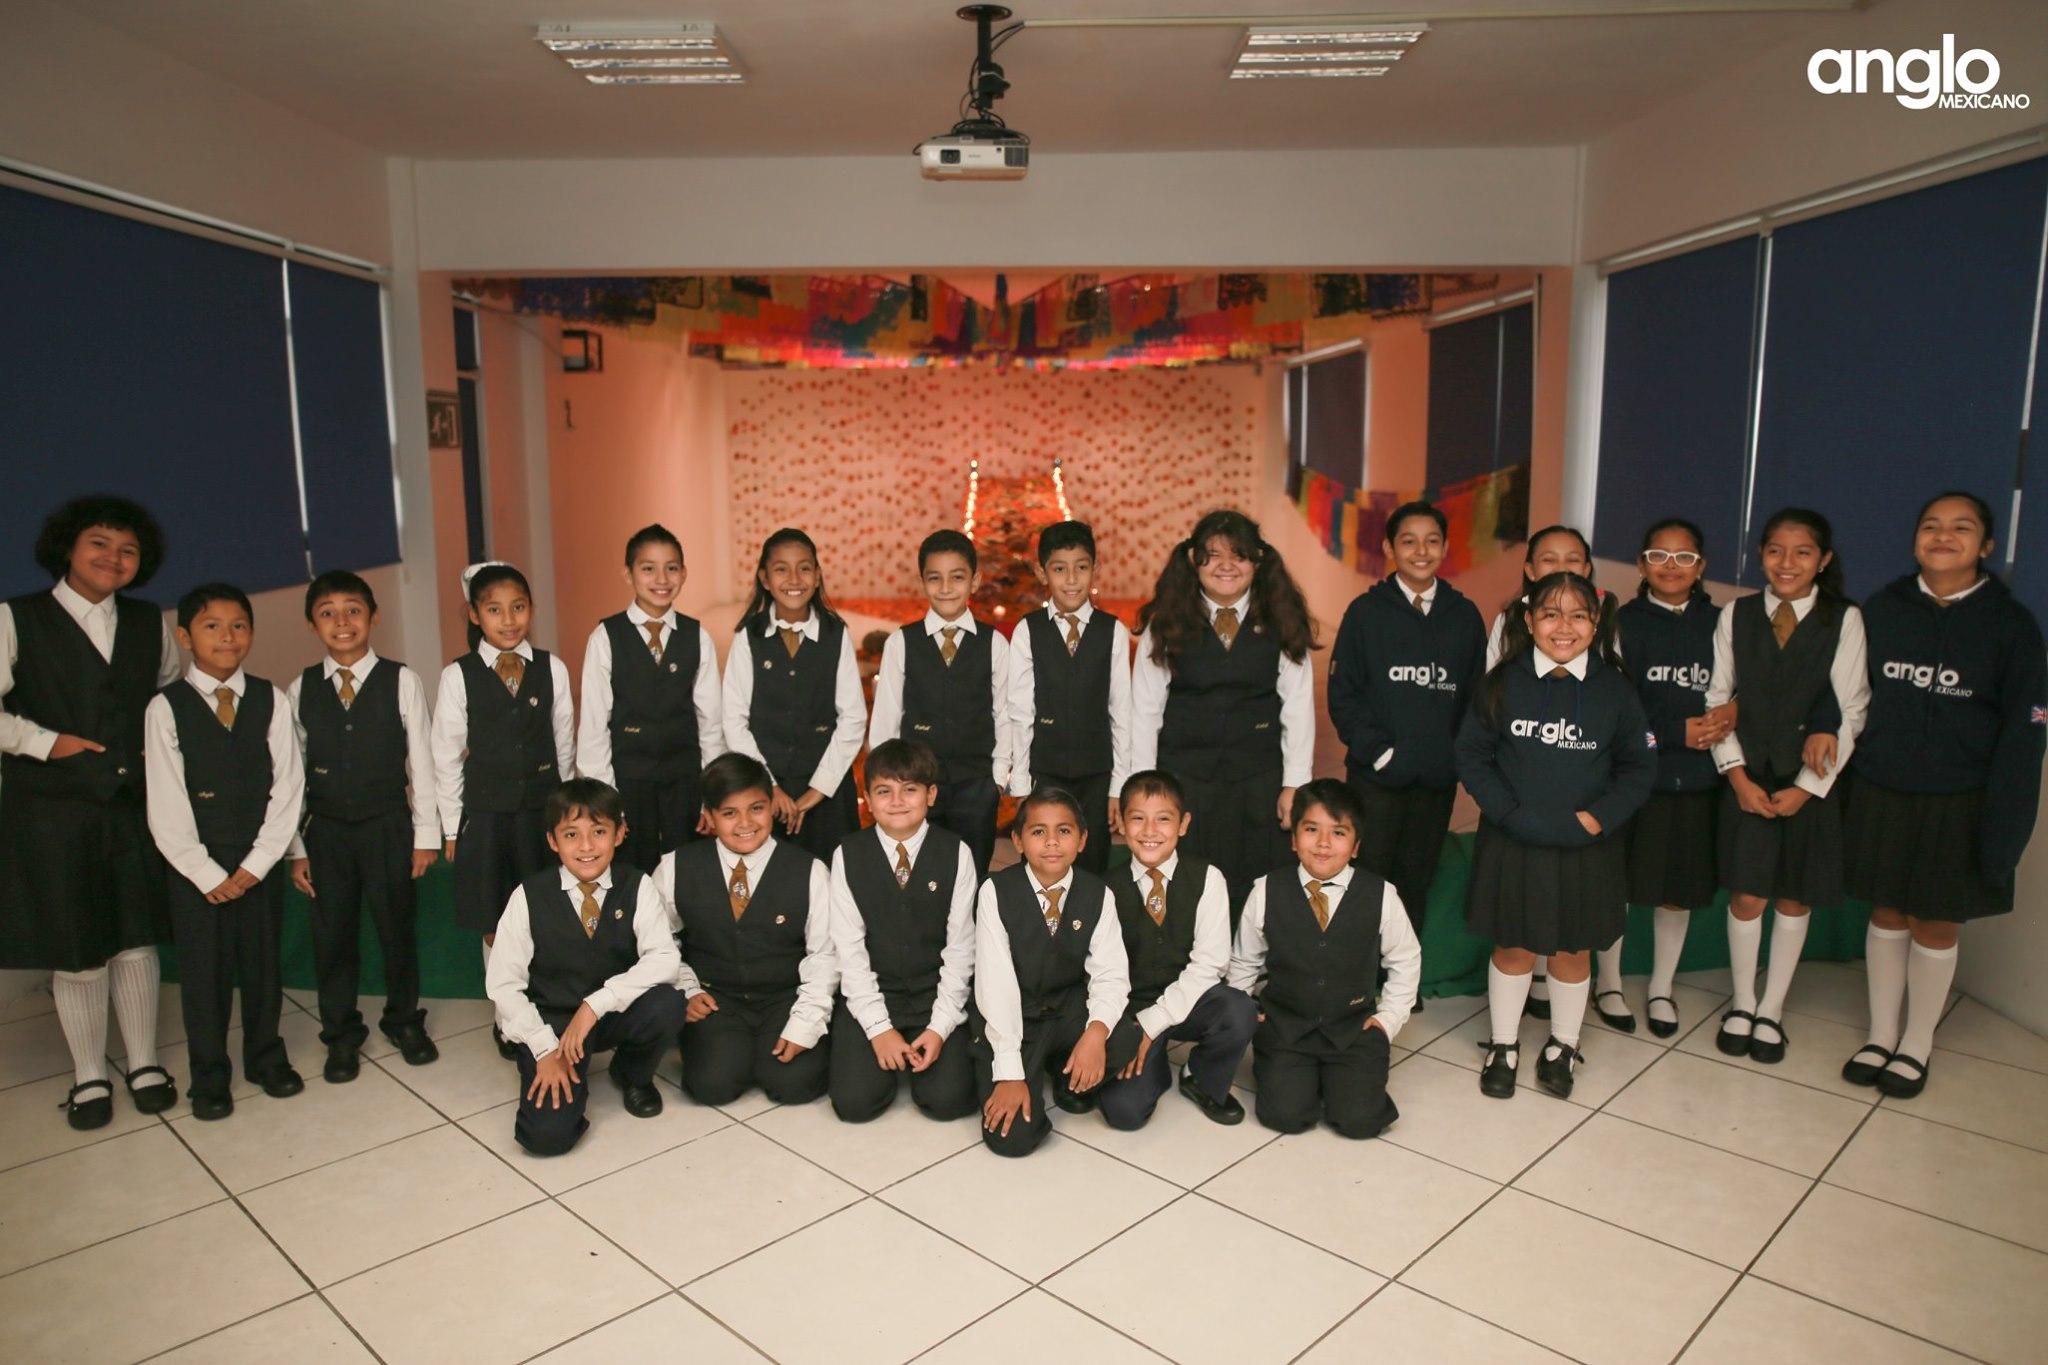 ANGLO MEXICANO DE COATZACOALCOS-VISITA-ALTARES-013